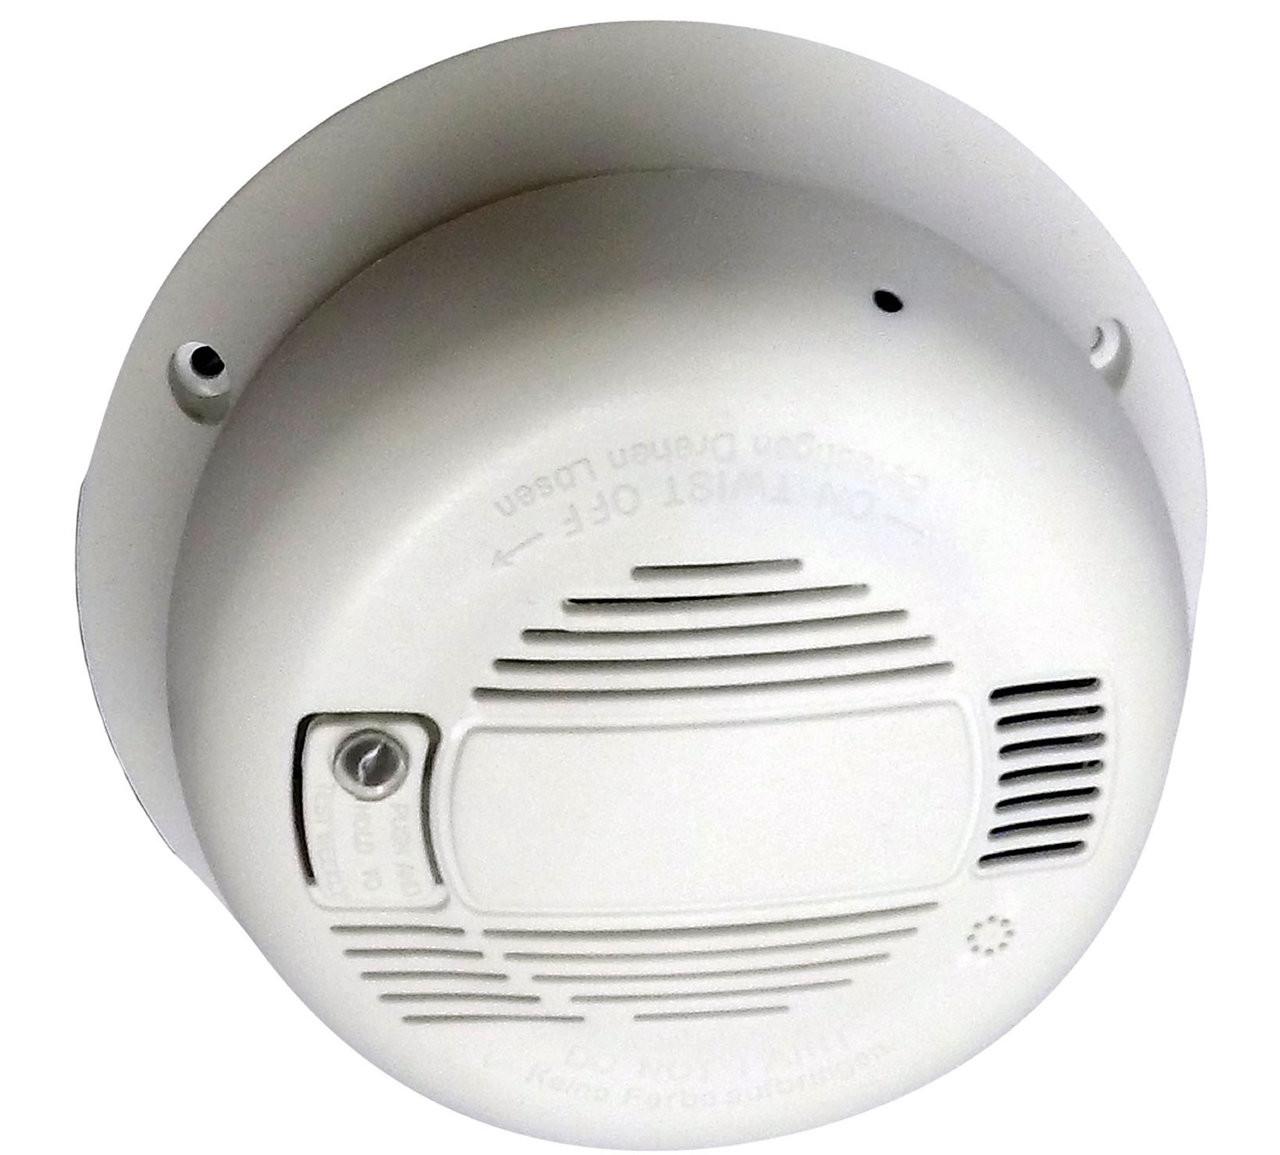 Smoke Detector Hidden Camera (Horizontal) w/ WiFi Internet Remote ...